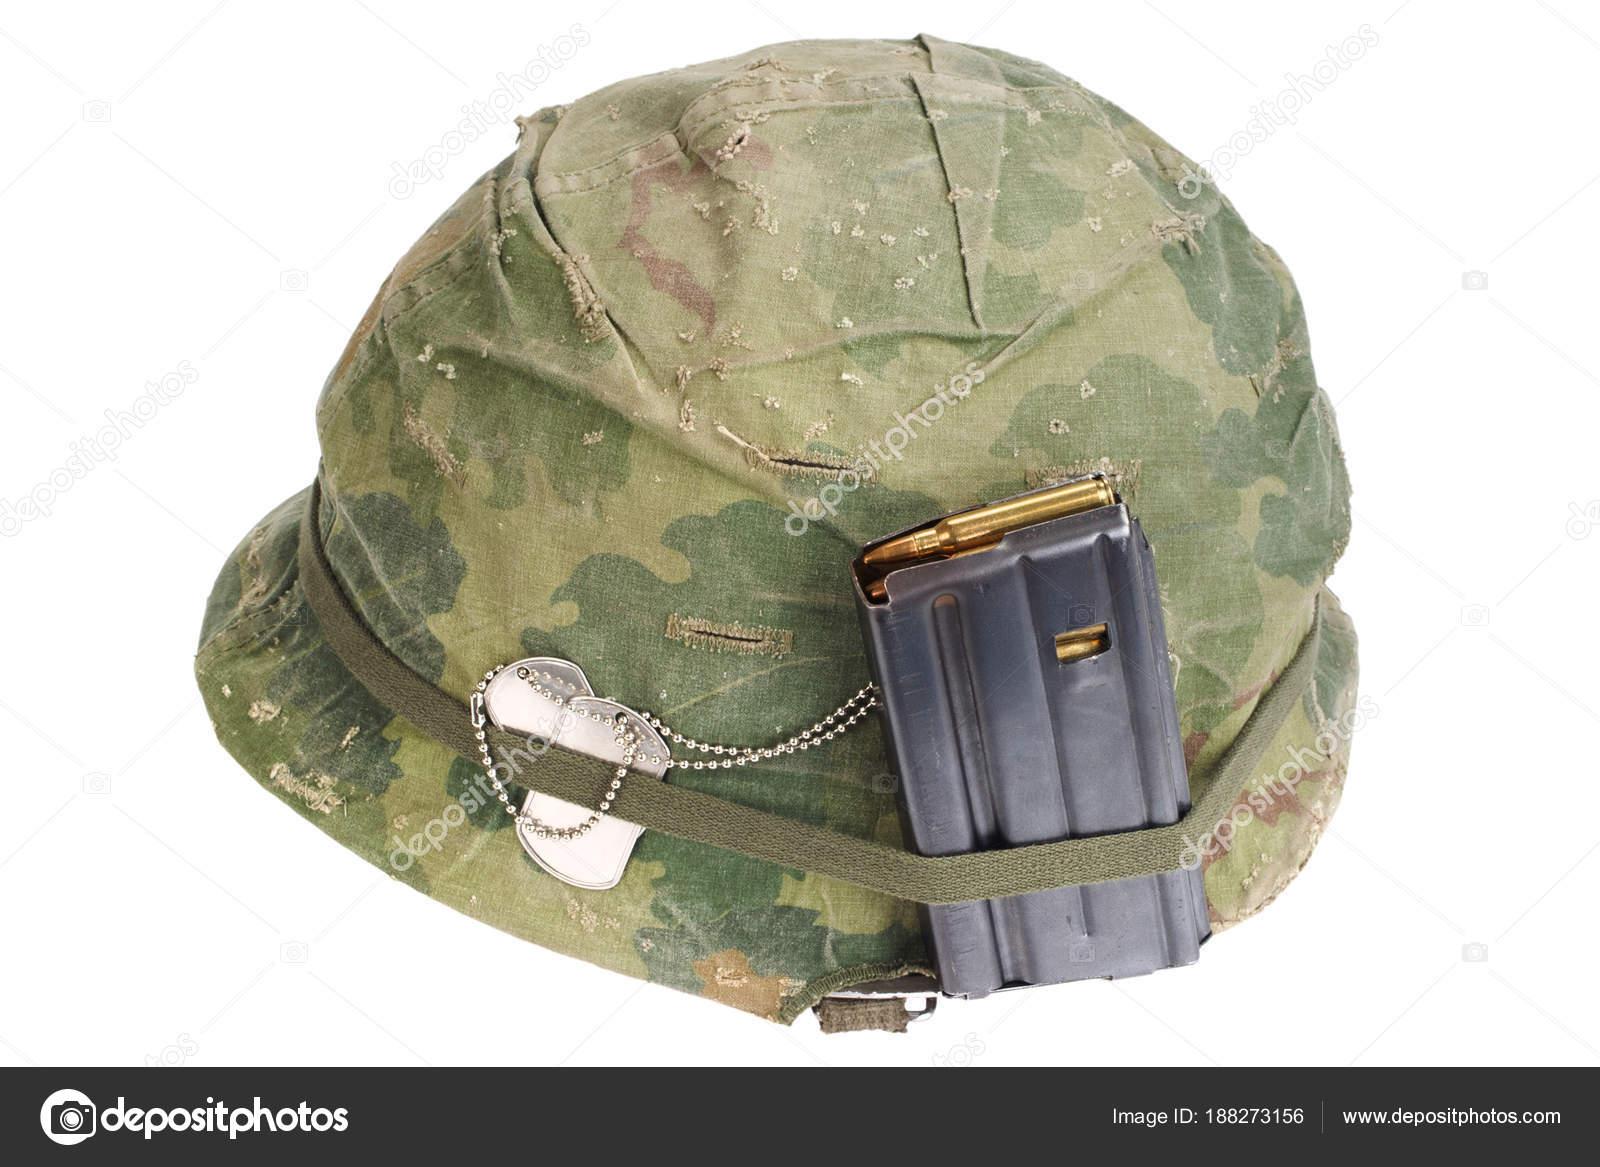 Army Helmet Vietnam War Period 1964 1974 Stock Photo C Zim90 188273156